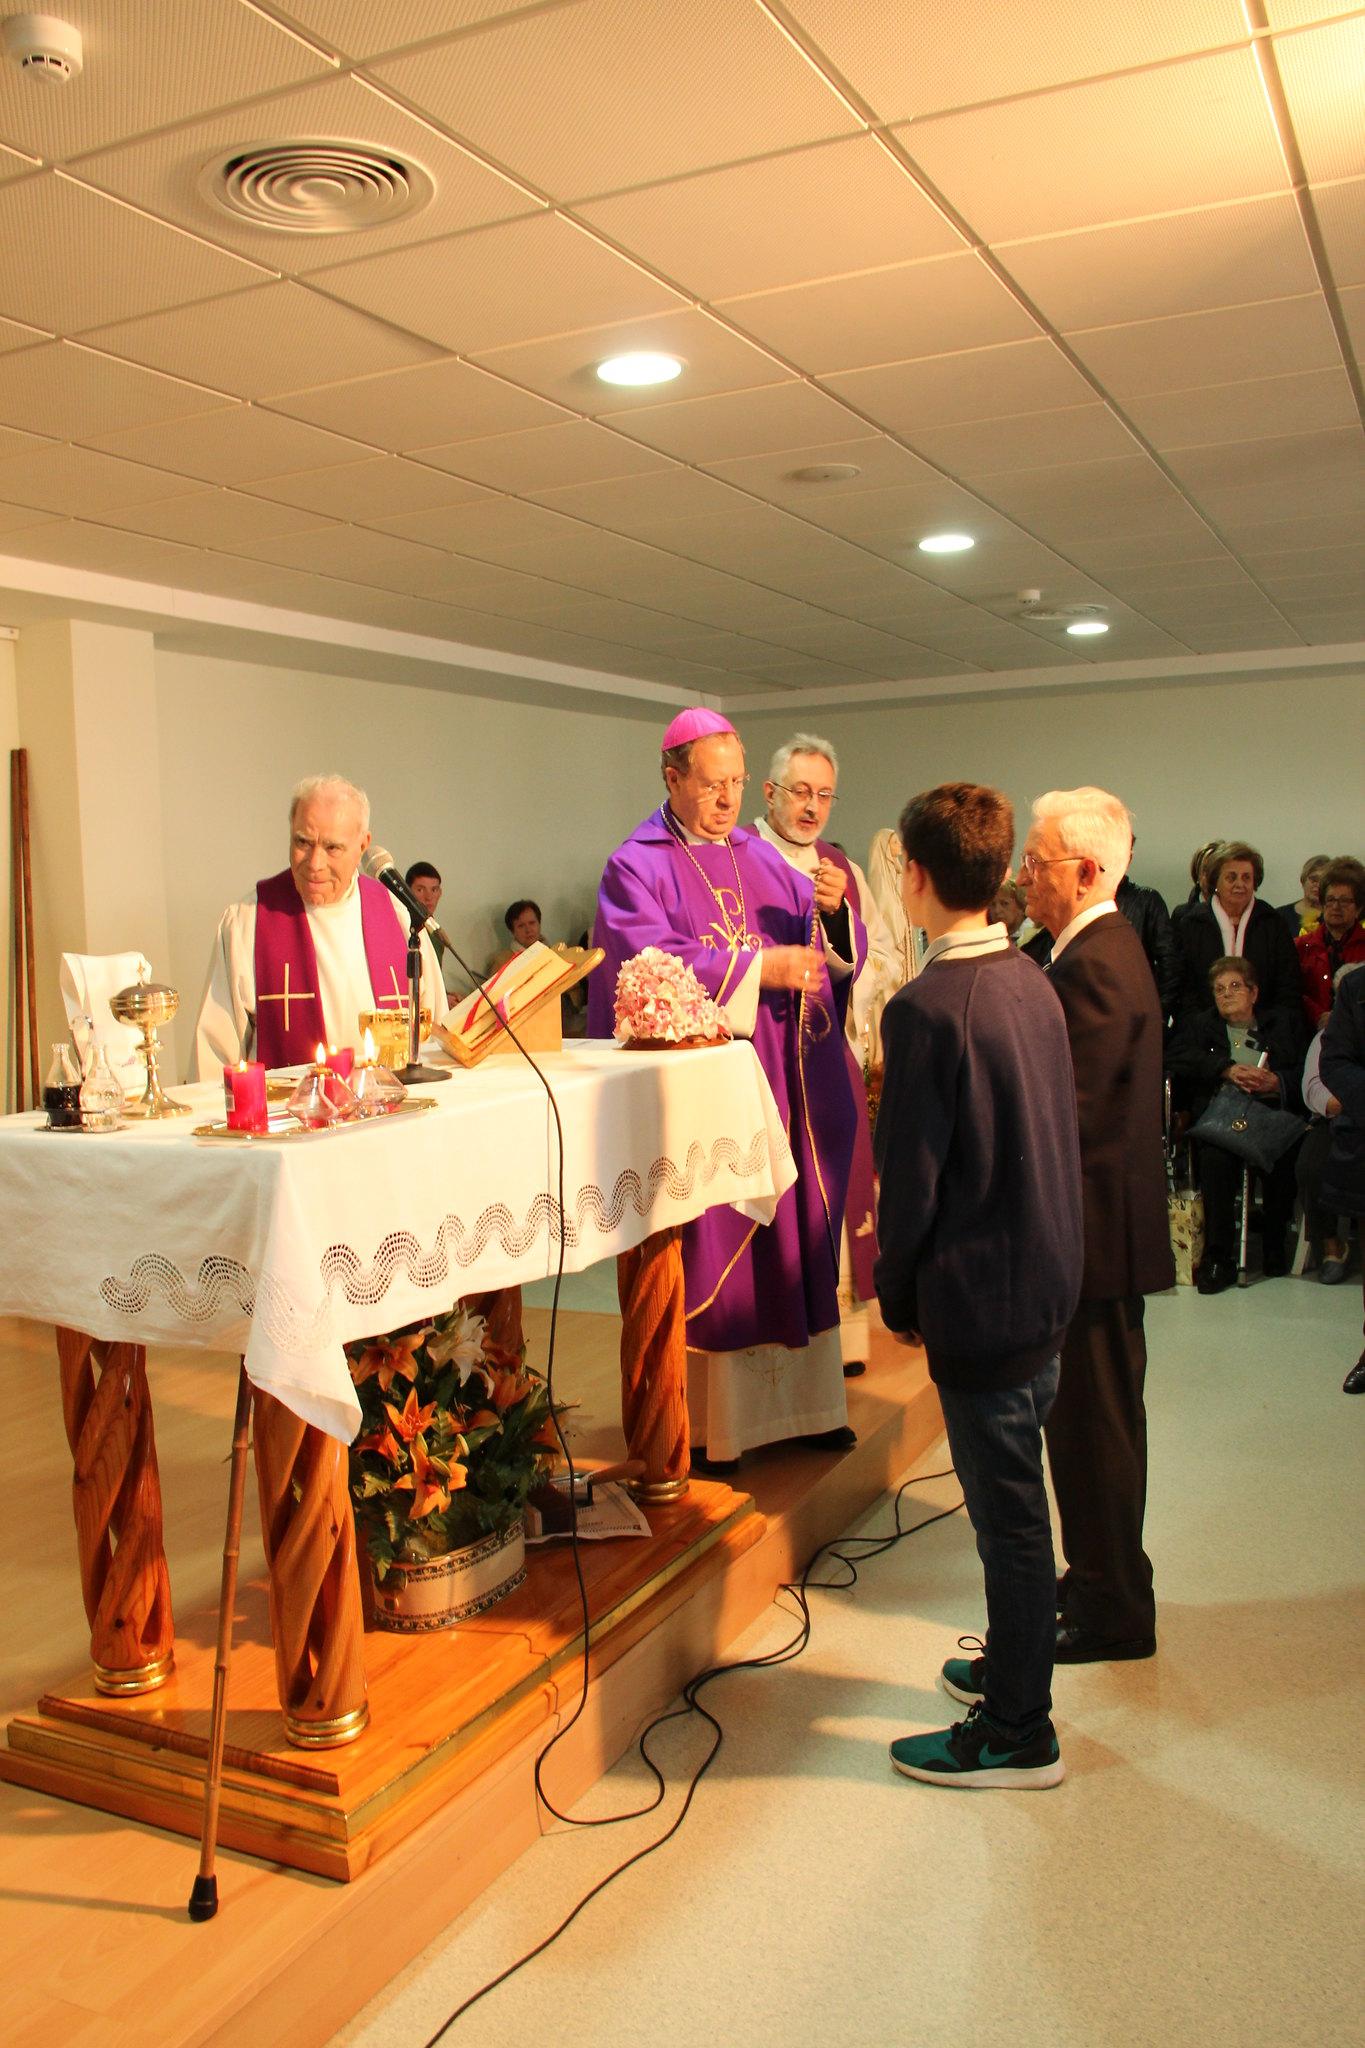 (2016-02-13) - Inauguración Virgen De Lourdes, La Molineta - Archivo La Molineta (039)